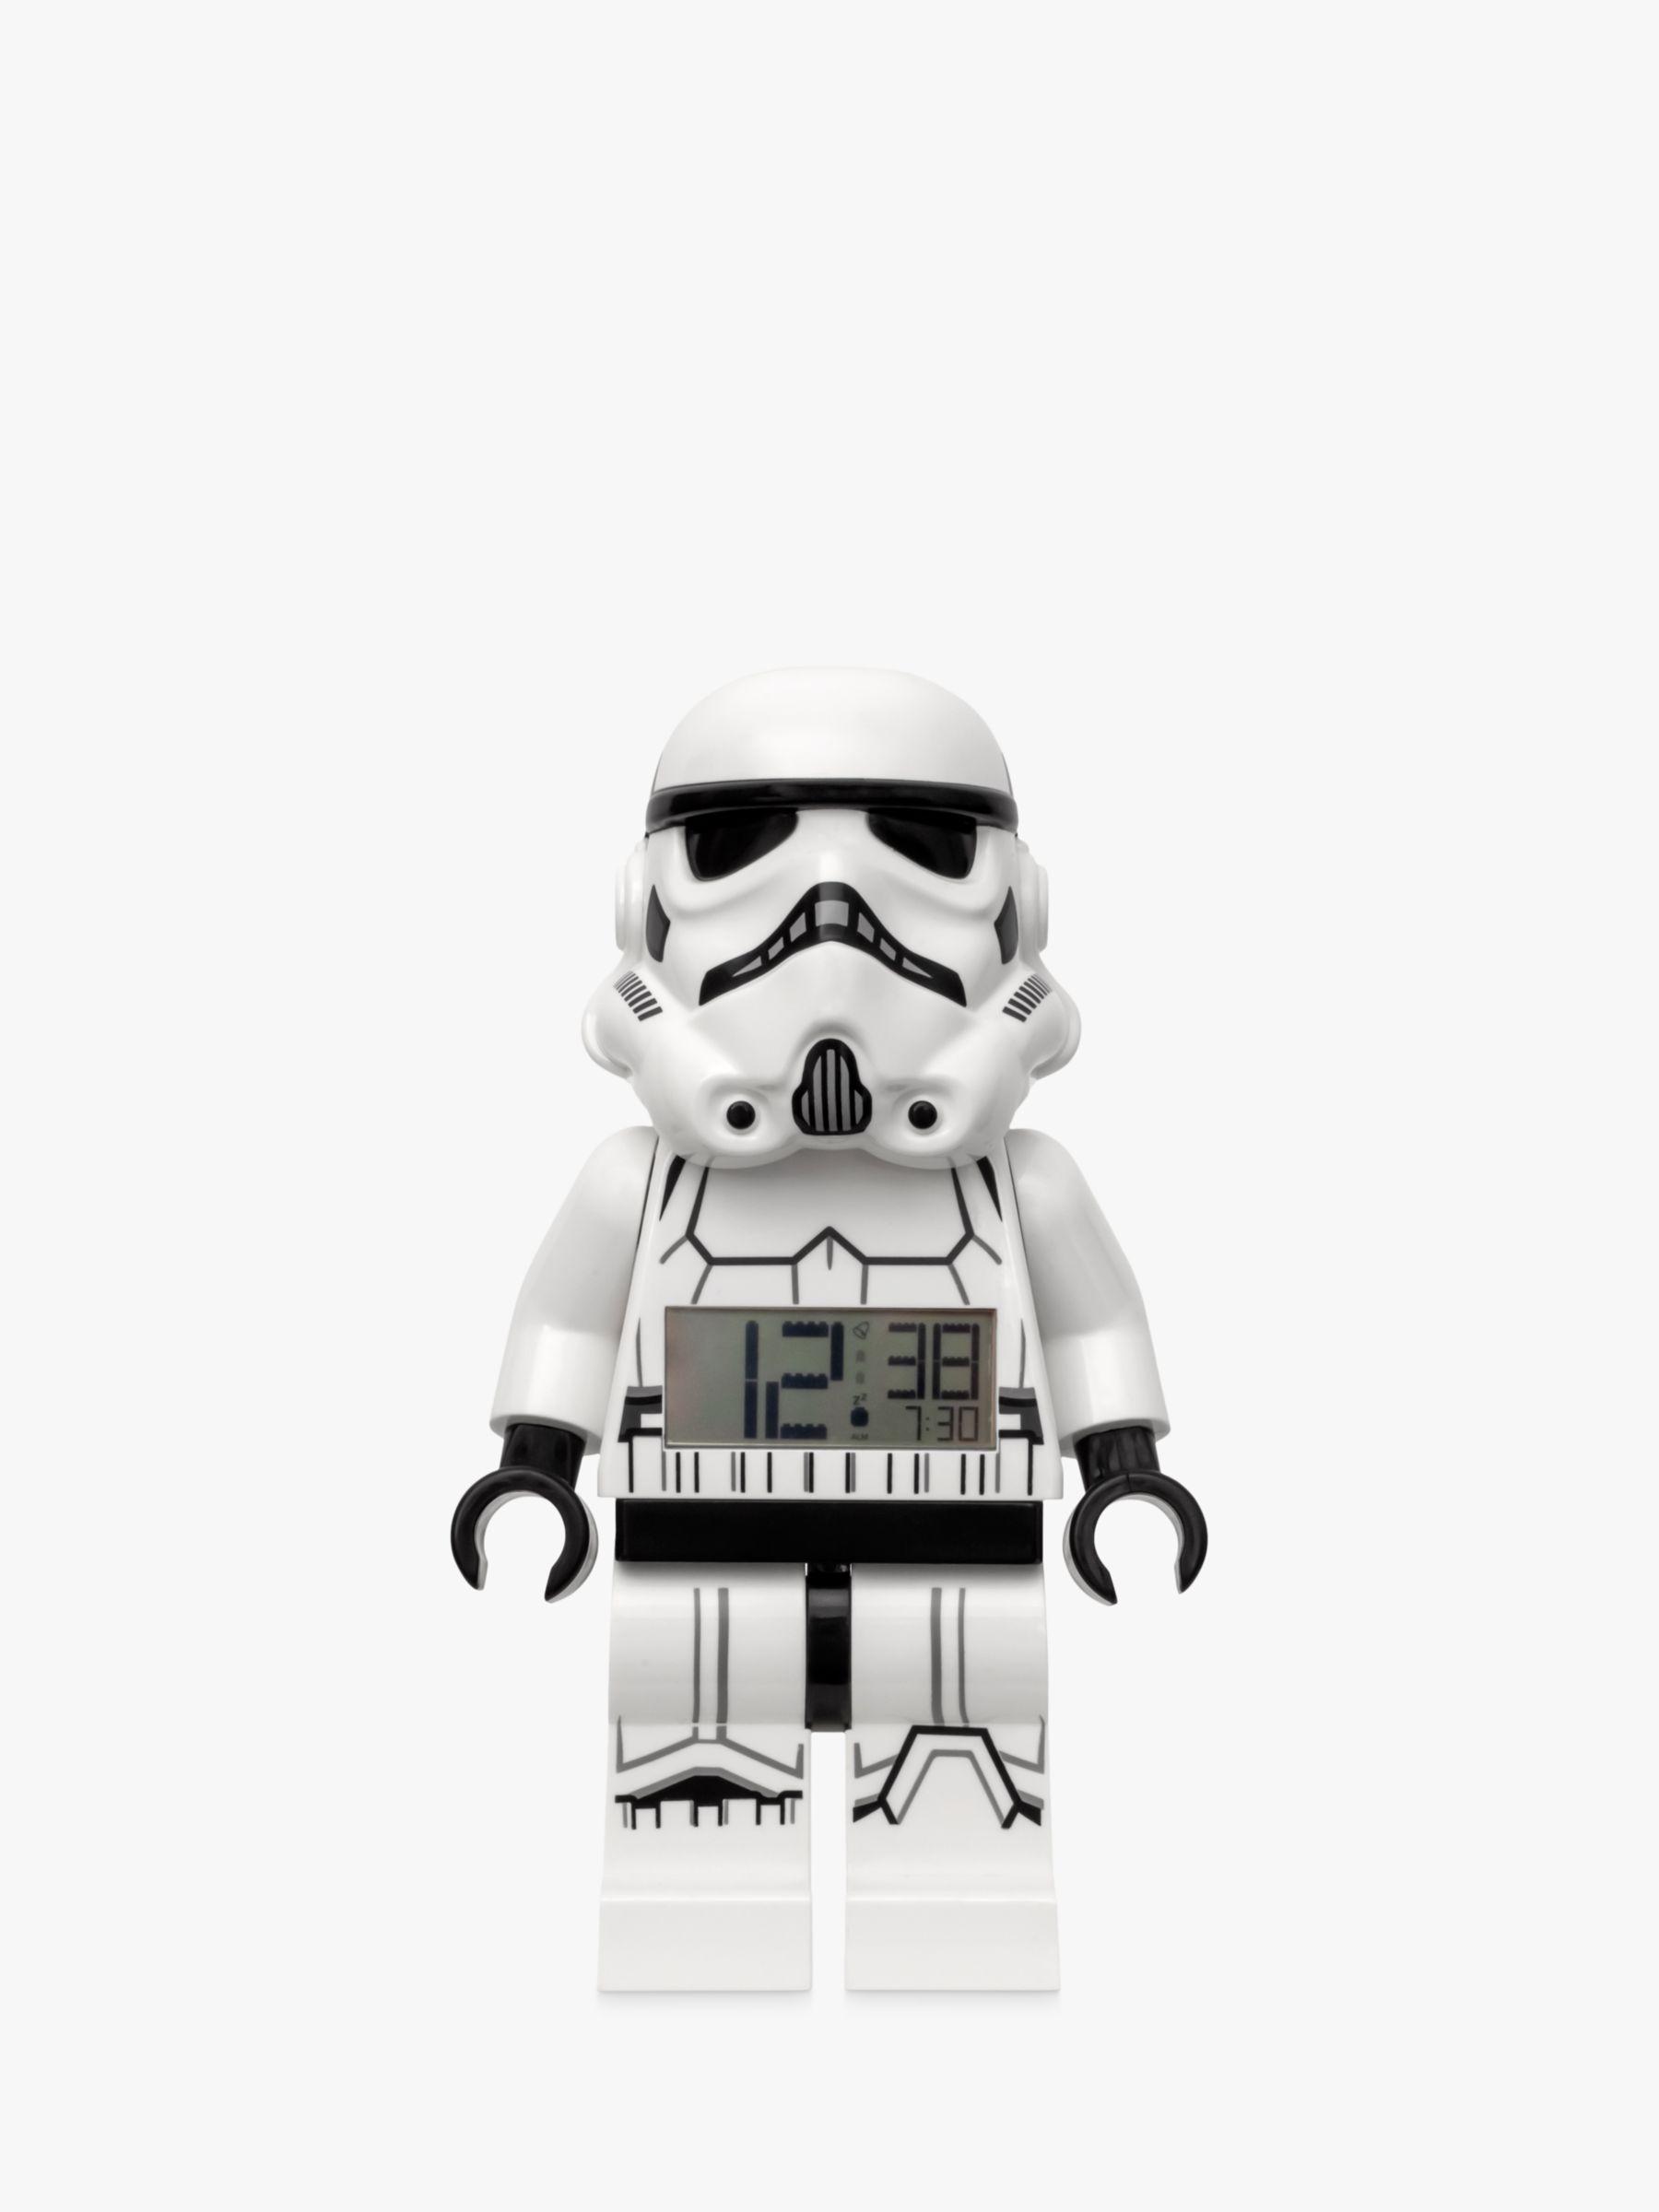 Lego Star Wars Stormtrooper Minifigure